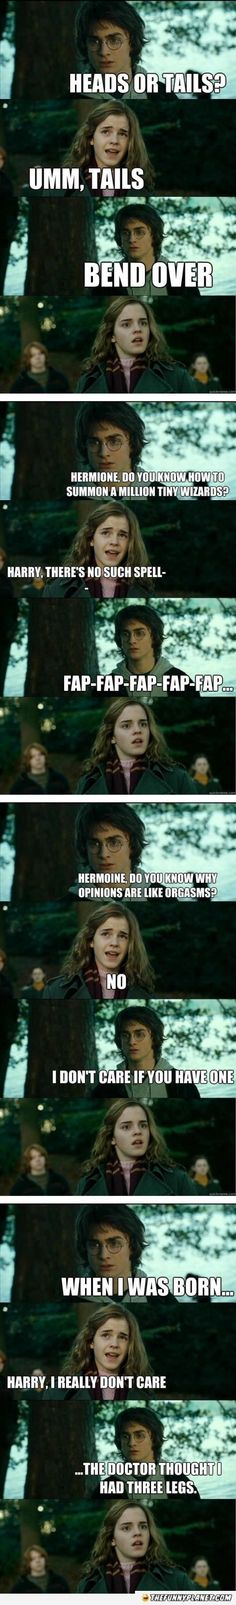 Harry Potter Pick Up Lines.